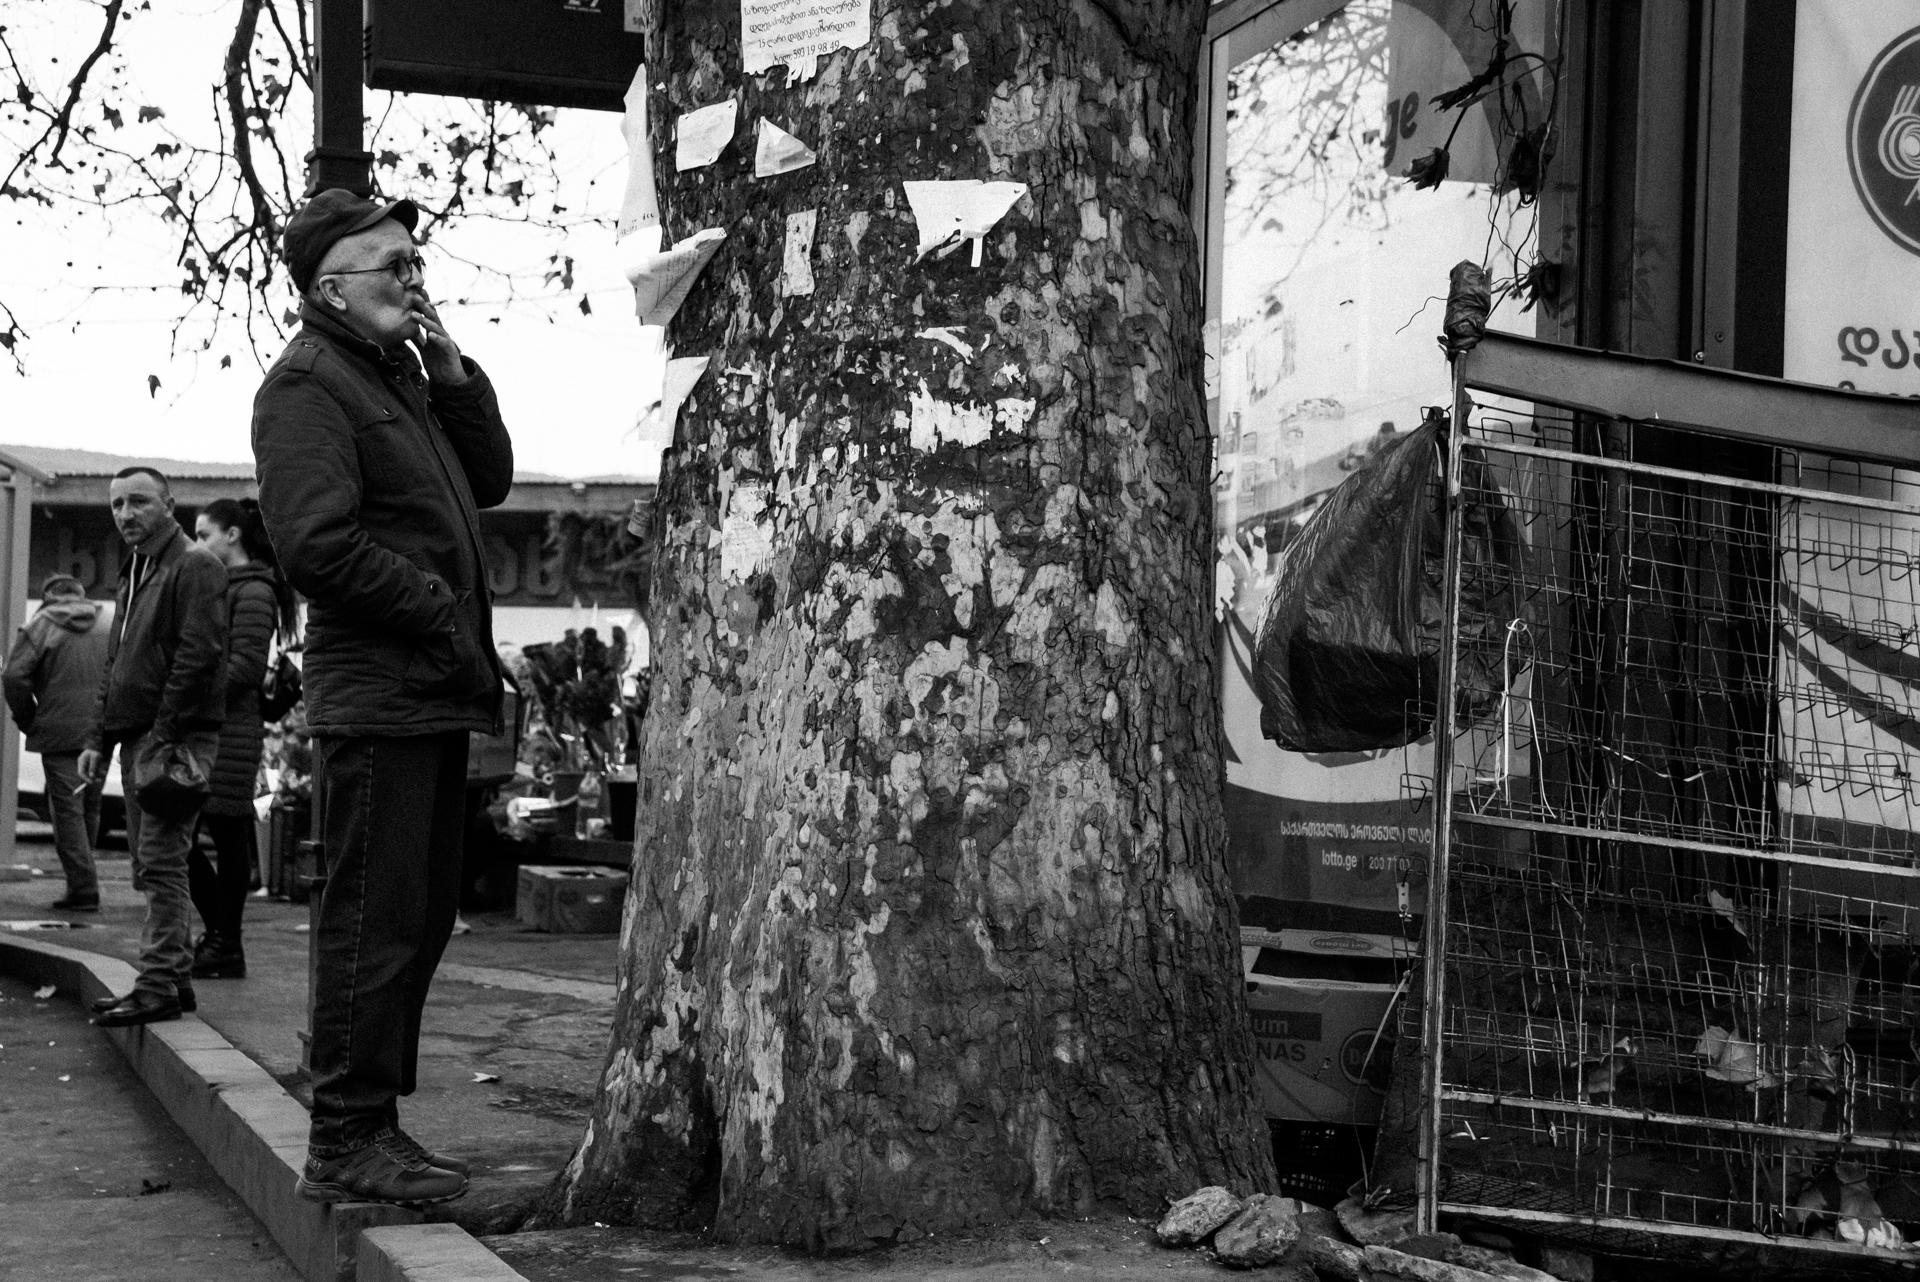 tbilisi-georgia-black-and-white-photography (9).jpg